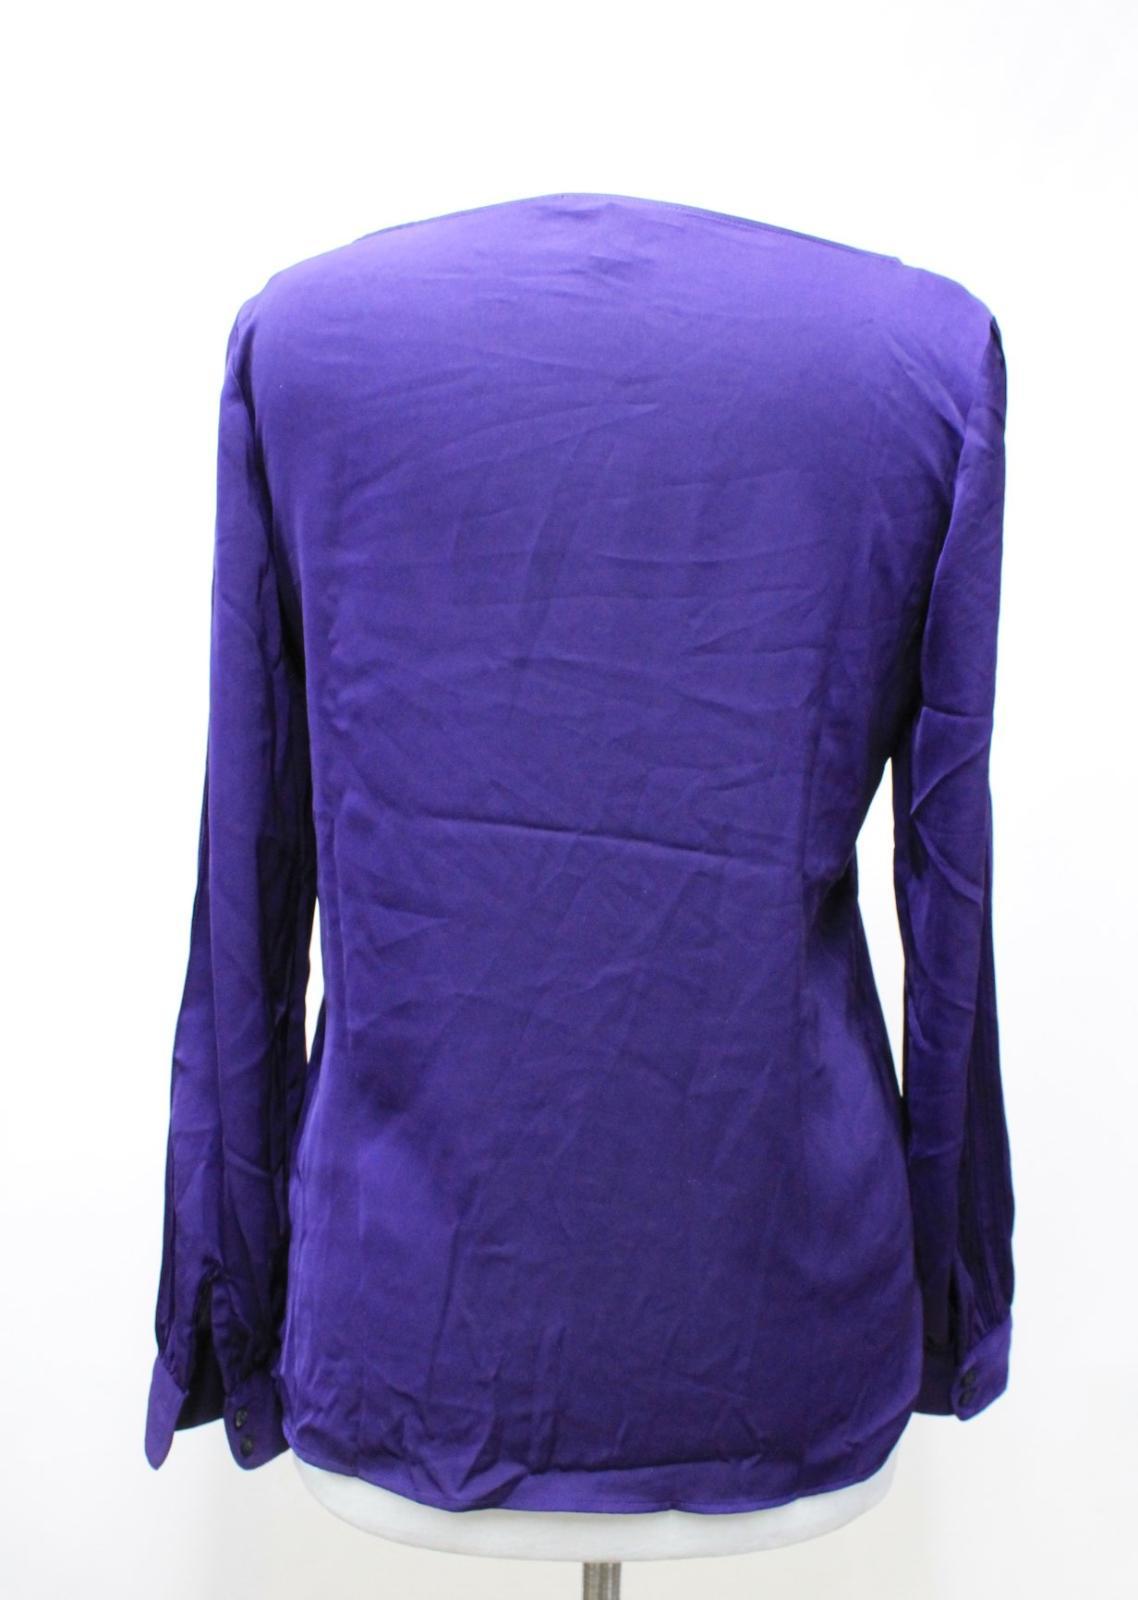 LAUREN-BY-RALPH-LAUREN-Ladies-Purple-Satin-Pleated-Sleeve-Round-Neck-Top-S thumbnail 3